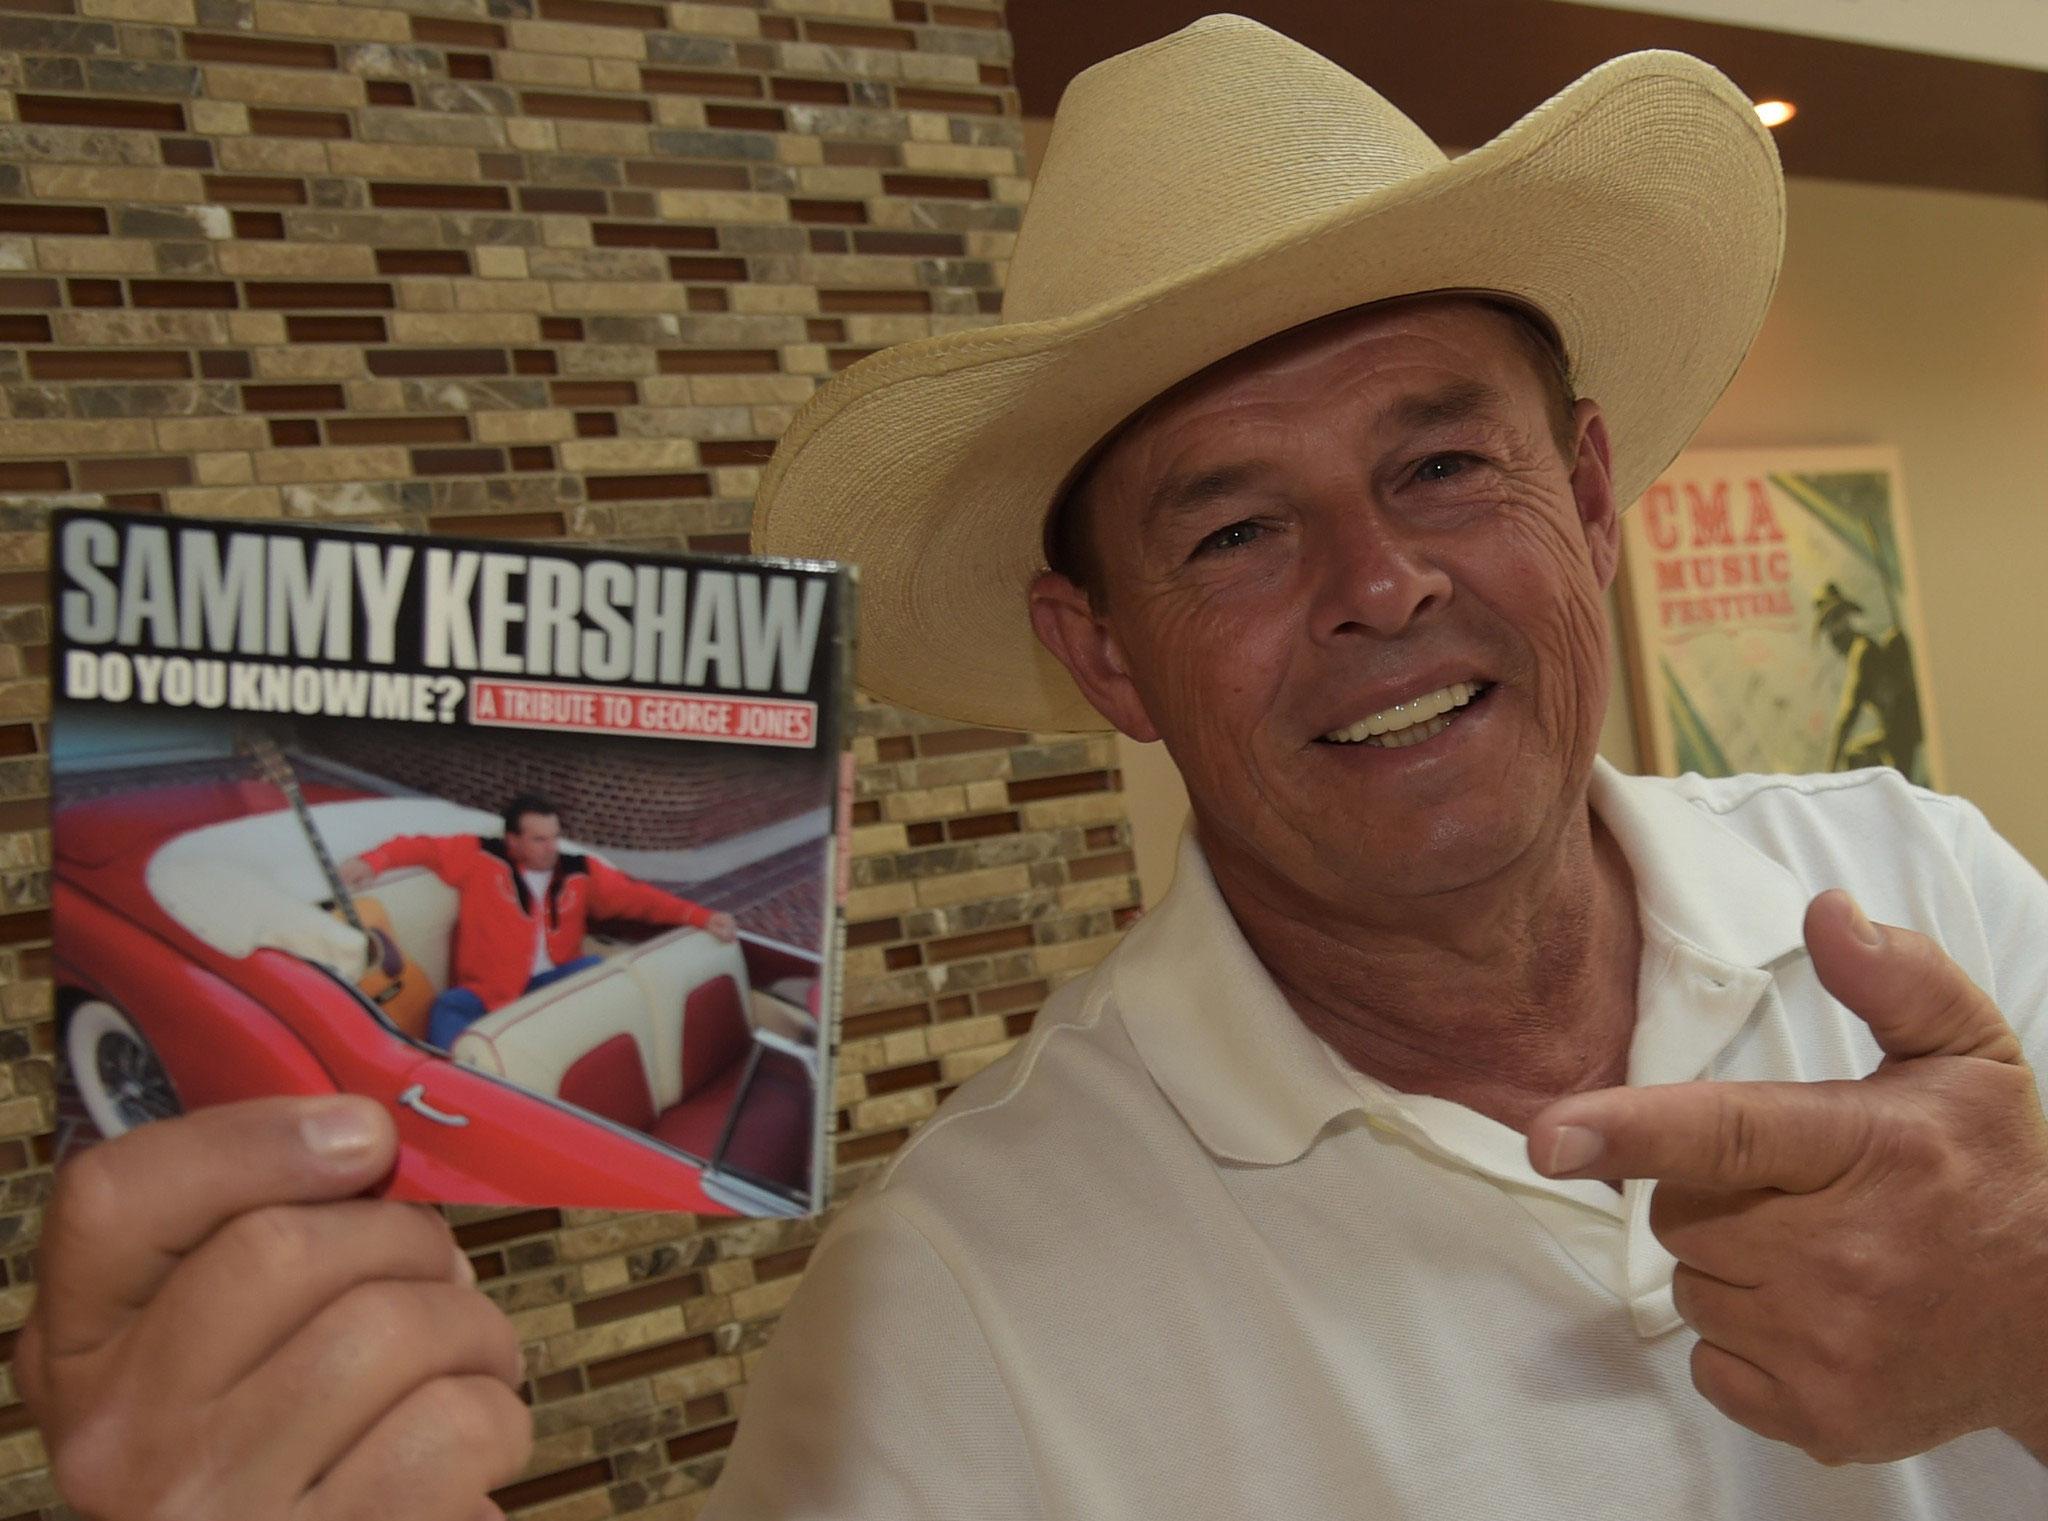 Sammy Kershaw - MyPage.